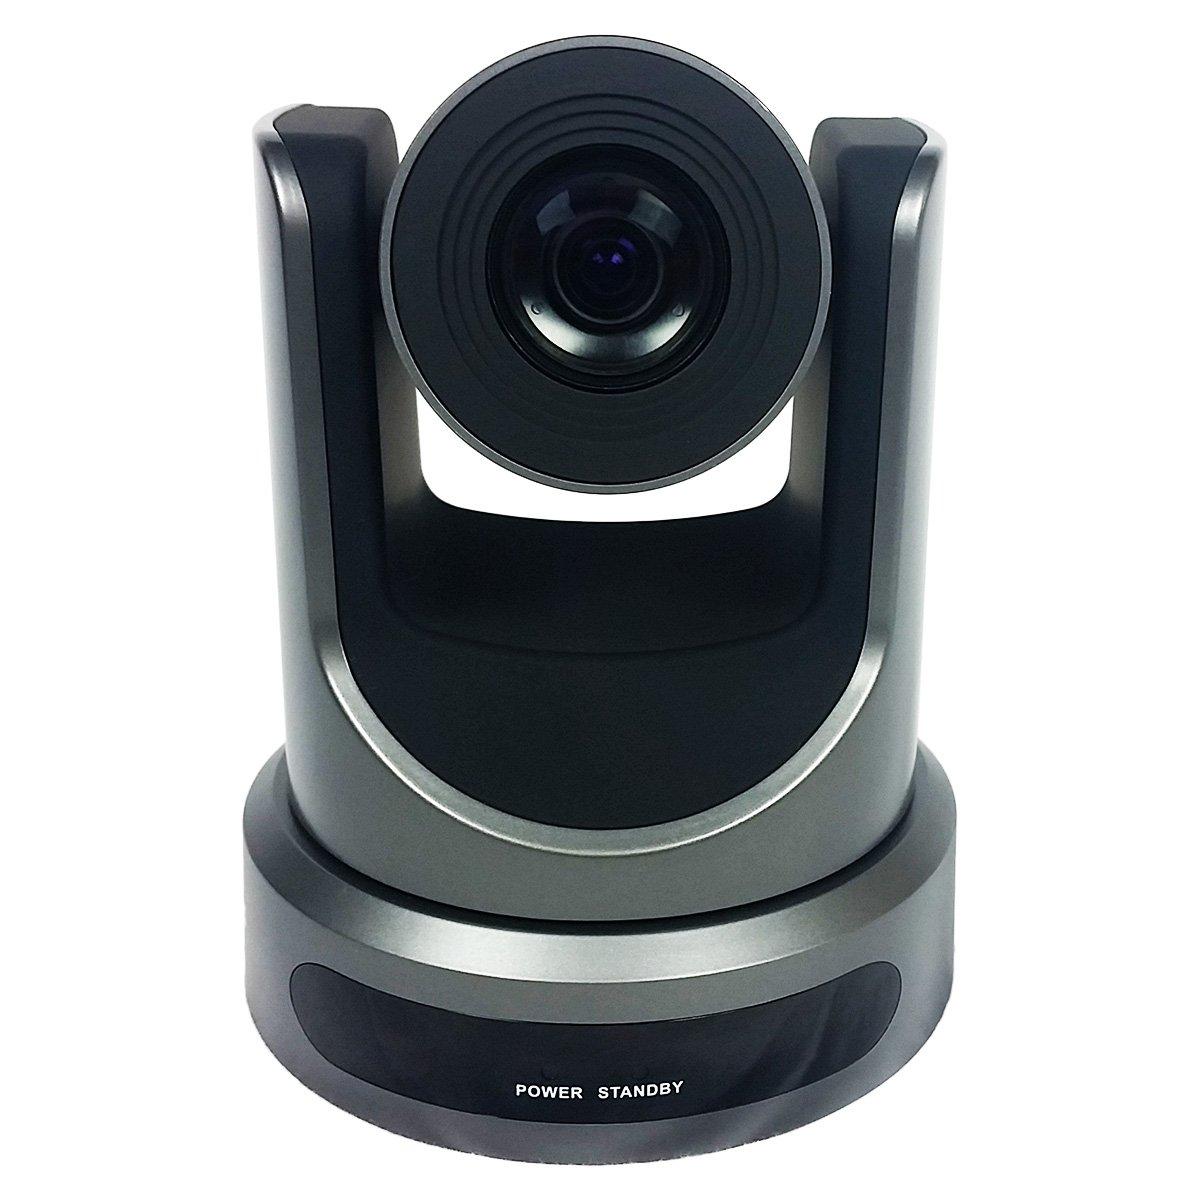 PTZOptics-20X-SDI GEN-2 PTZ IP Streaming Camera with Simultaneous HDMI and 3G-SDI Outputs - Gray by PTZOptics